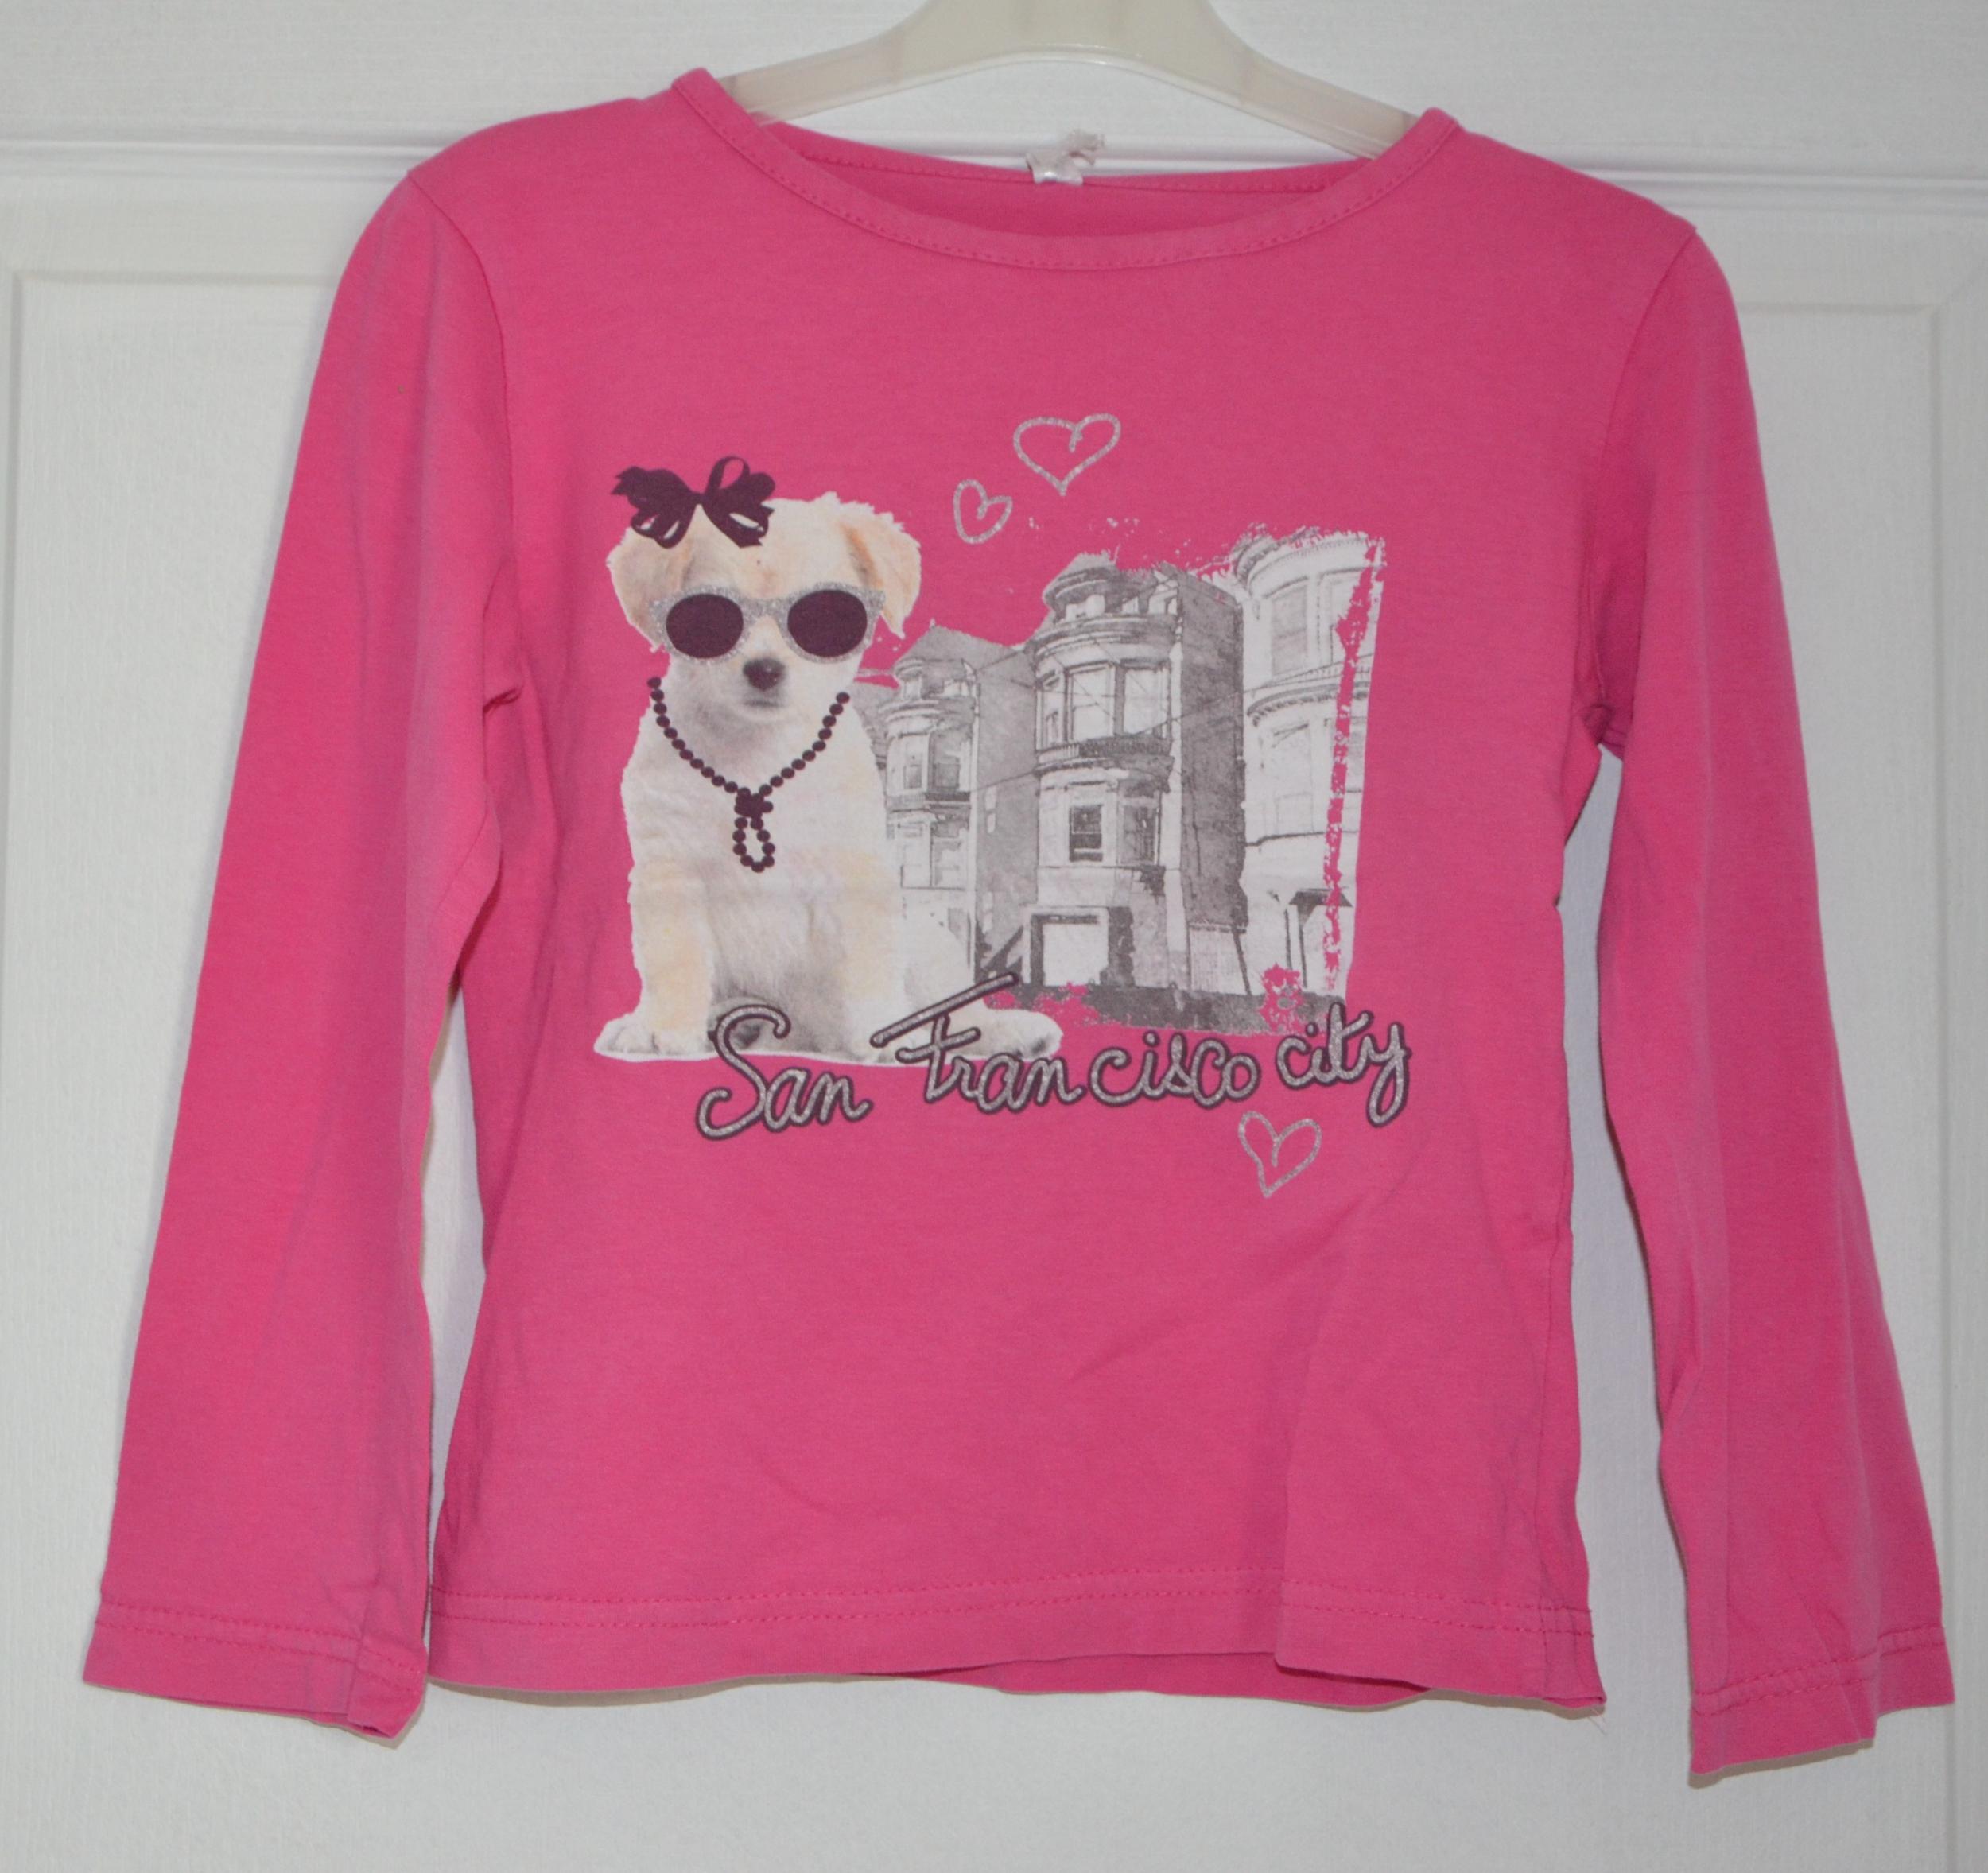 tee shirt rose manches longues fille 8 ans sans marque